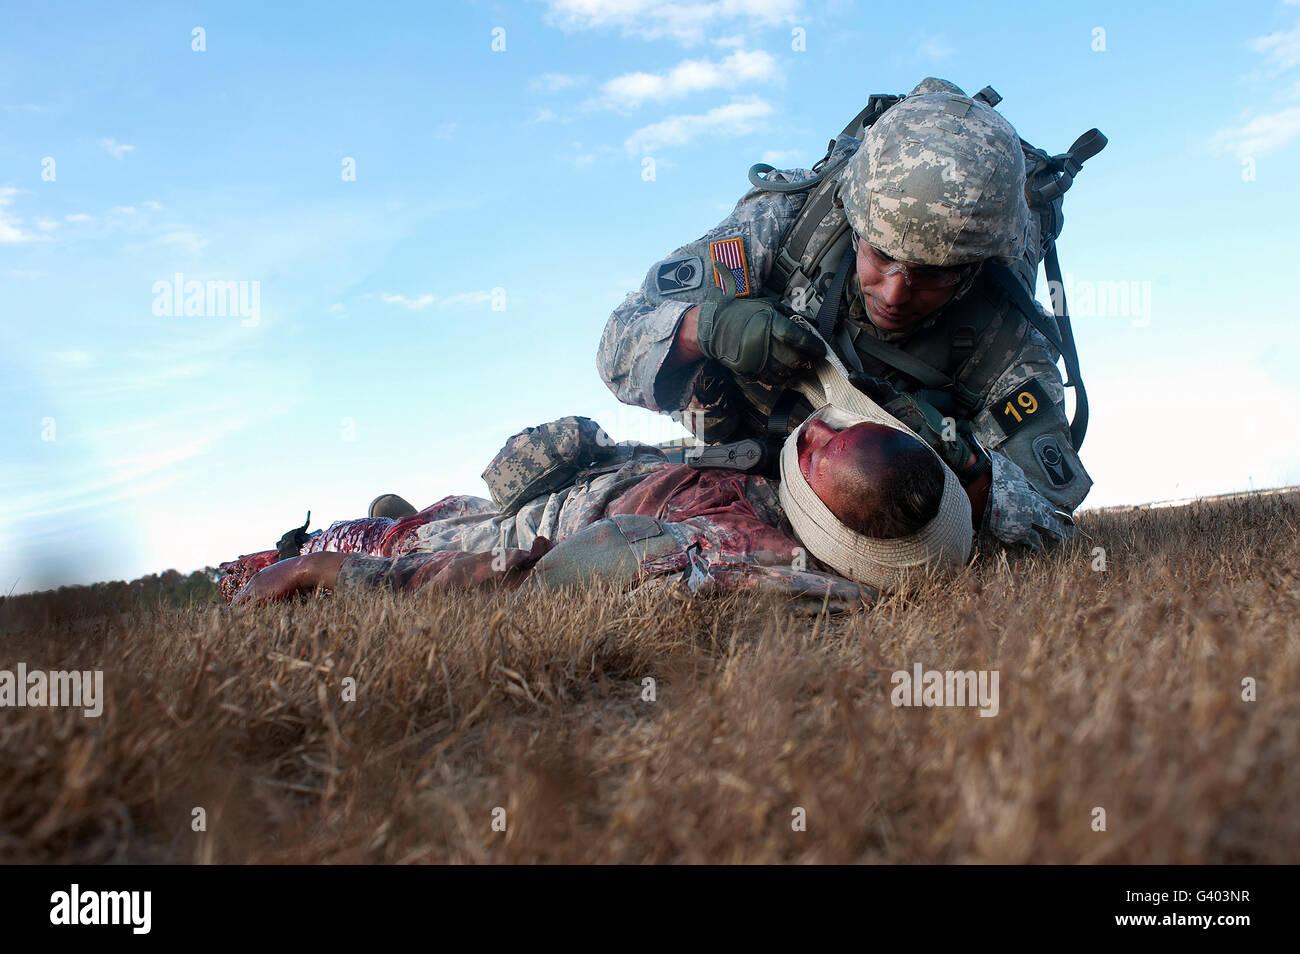 U.S. Army infantryman bandages an injured soldier. - Stock Image